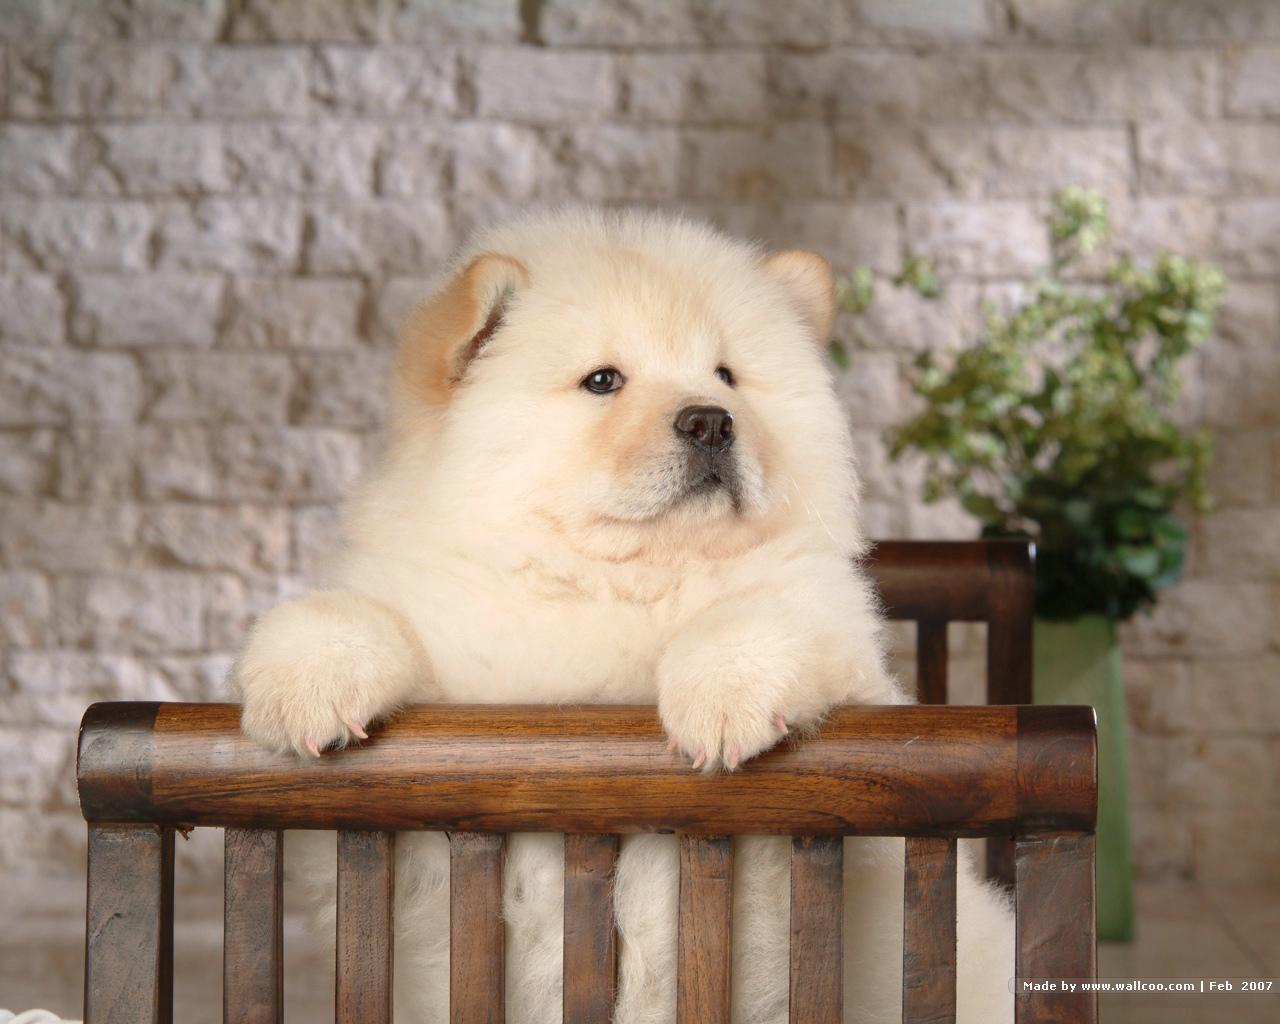 Chow Chow Wallpaper   Dogs Wallpaper 13936778 1280x1024